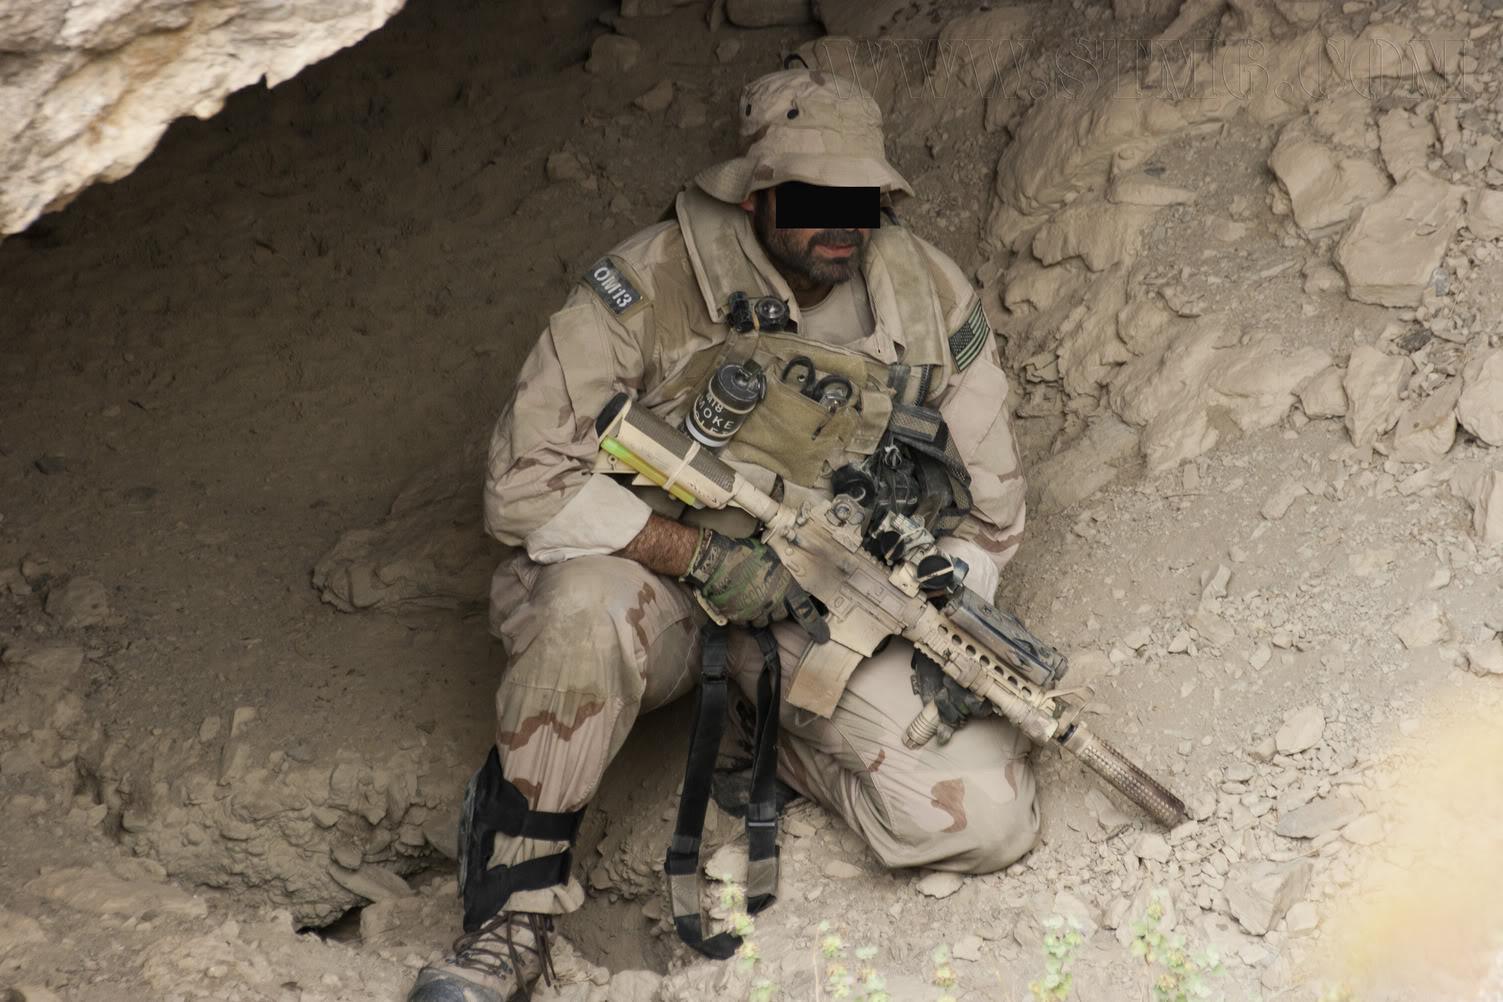 The Fallen Warriors - In honour of the fallen in OP. RW.  Reenactment moderno 2005 D9c1e4e6